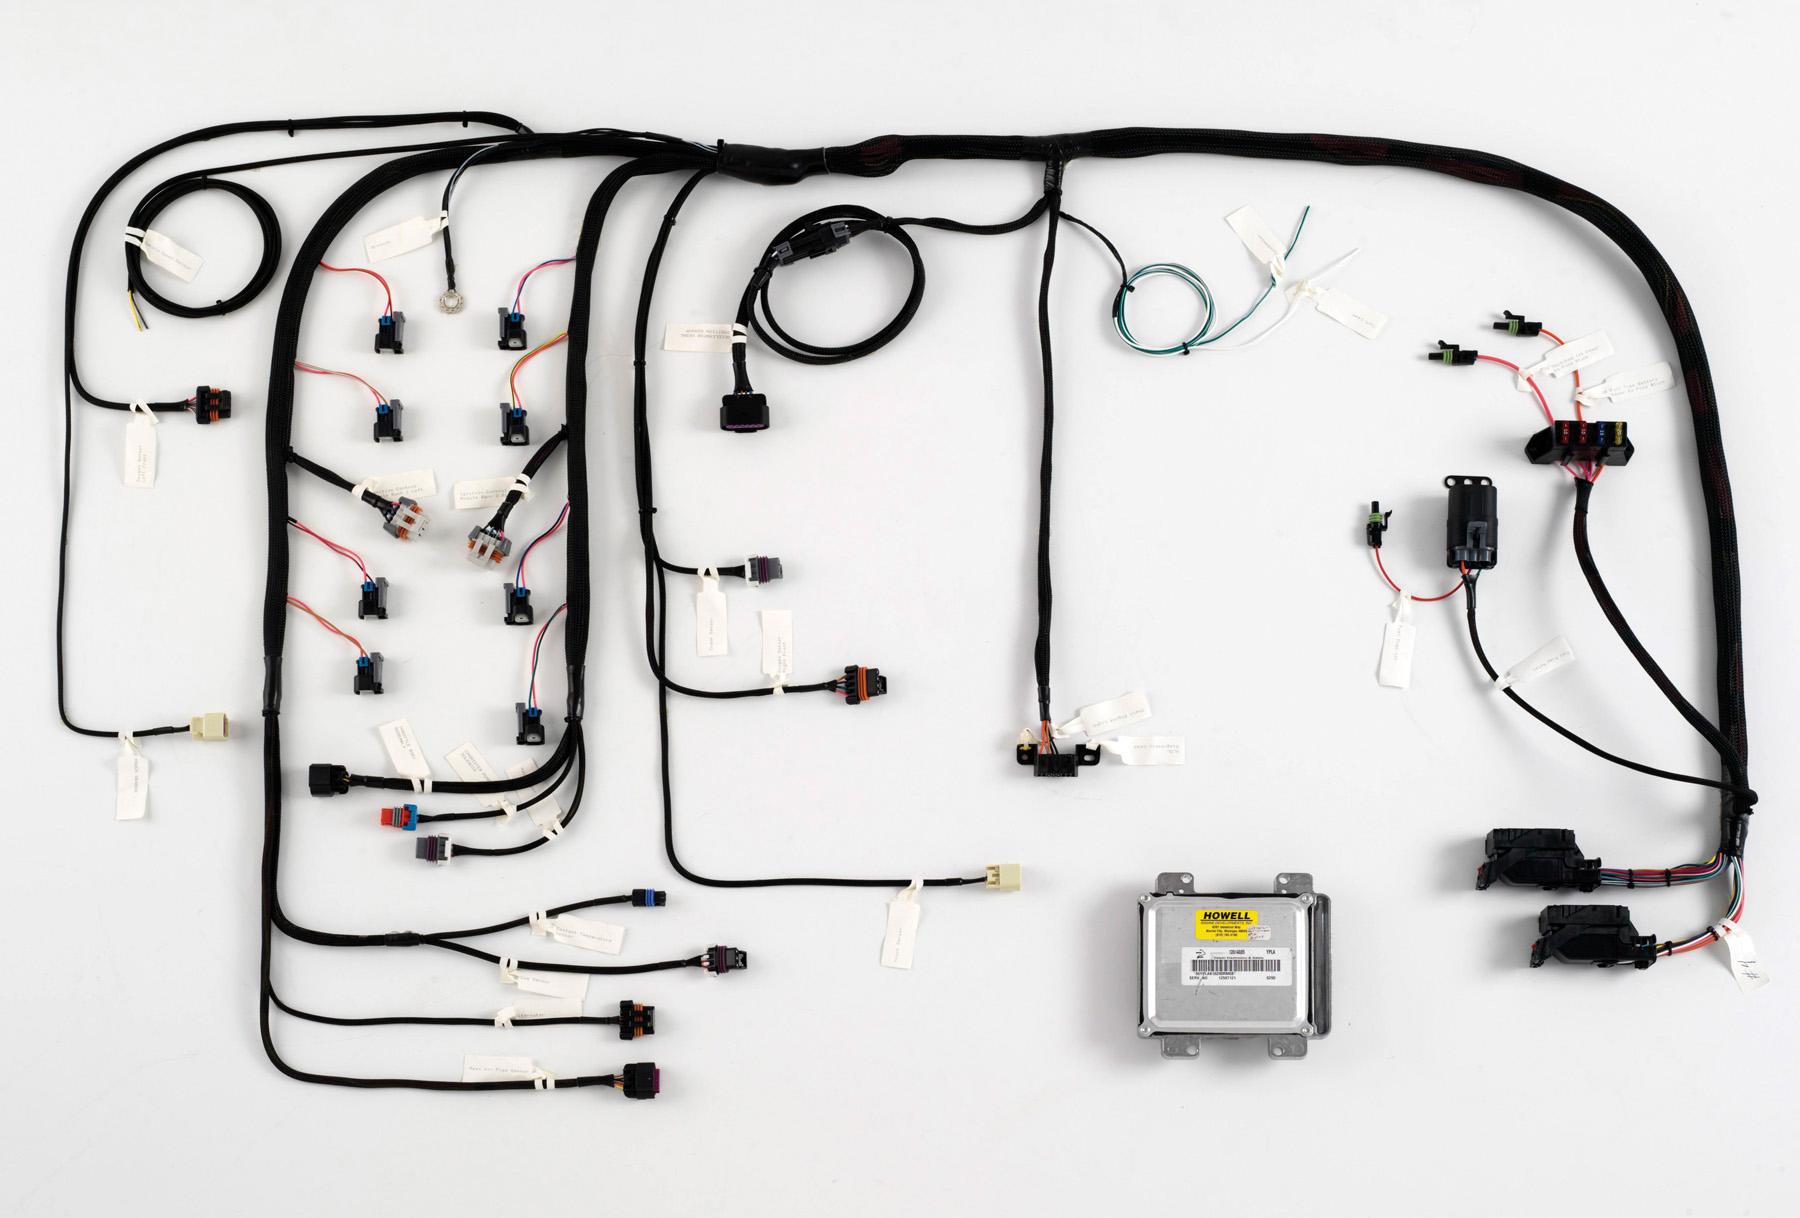 transplant a ls engine wiring